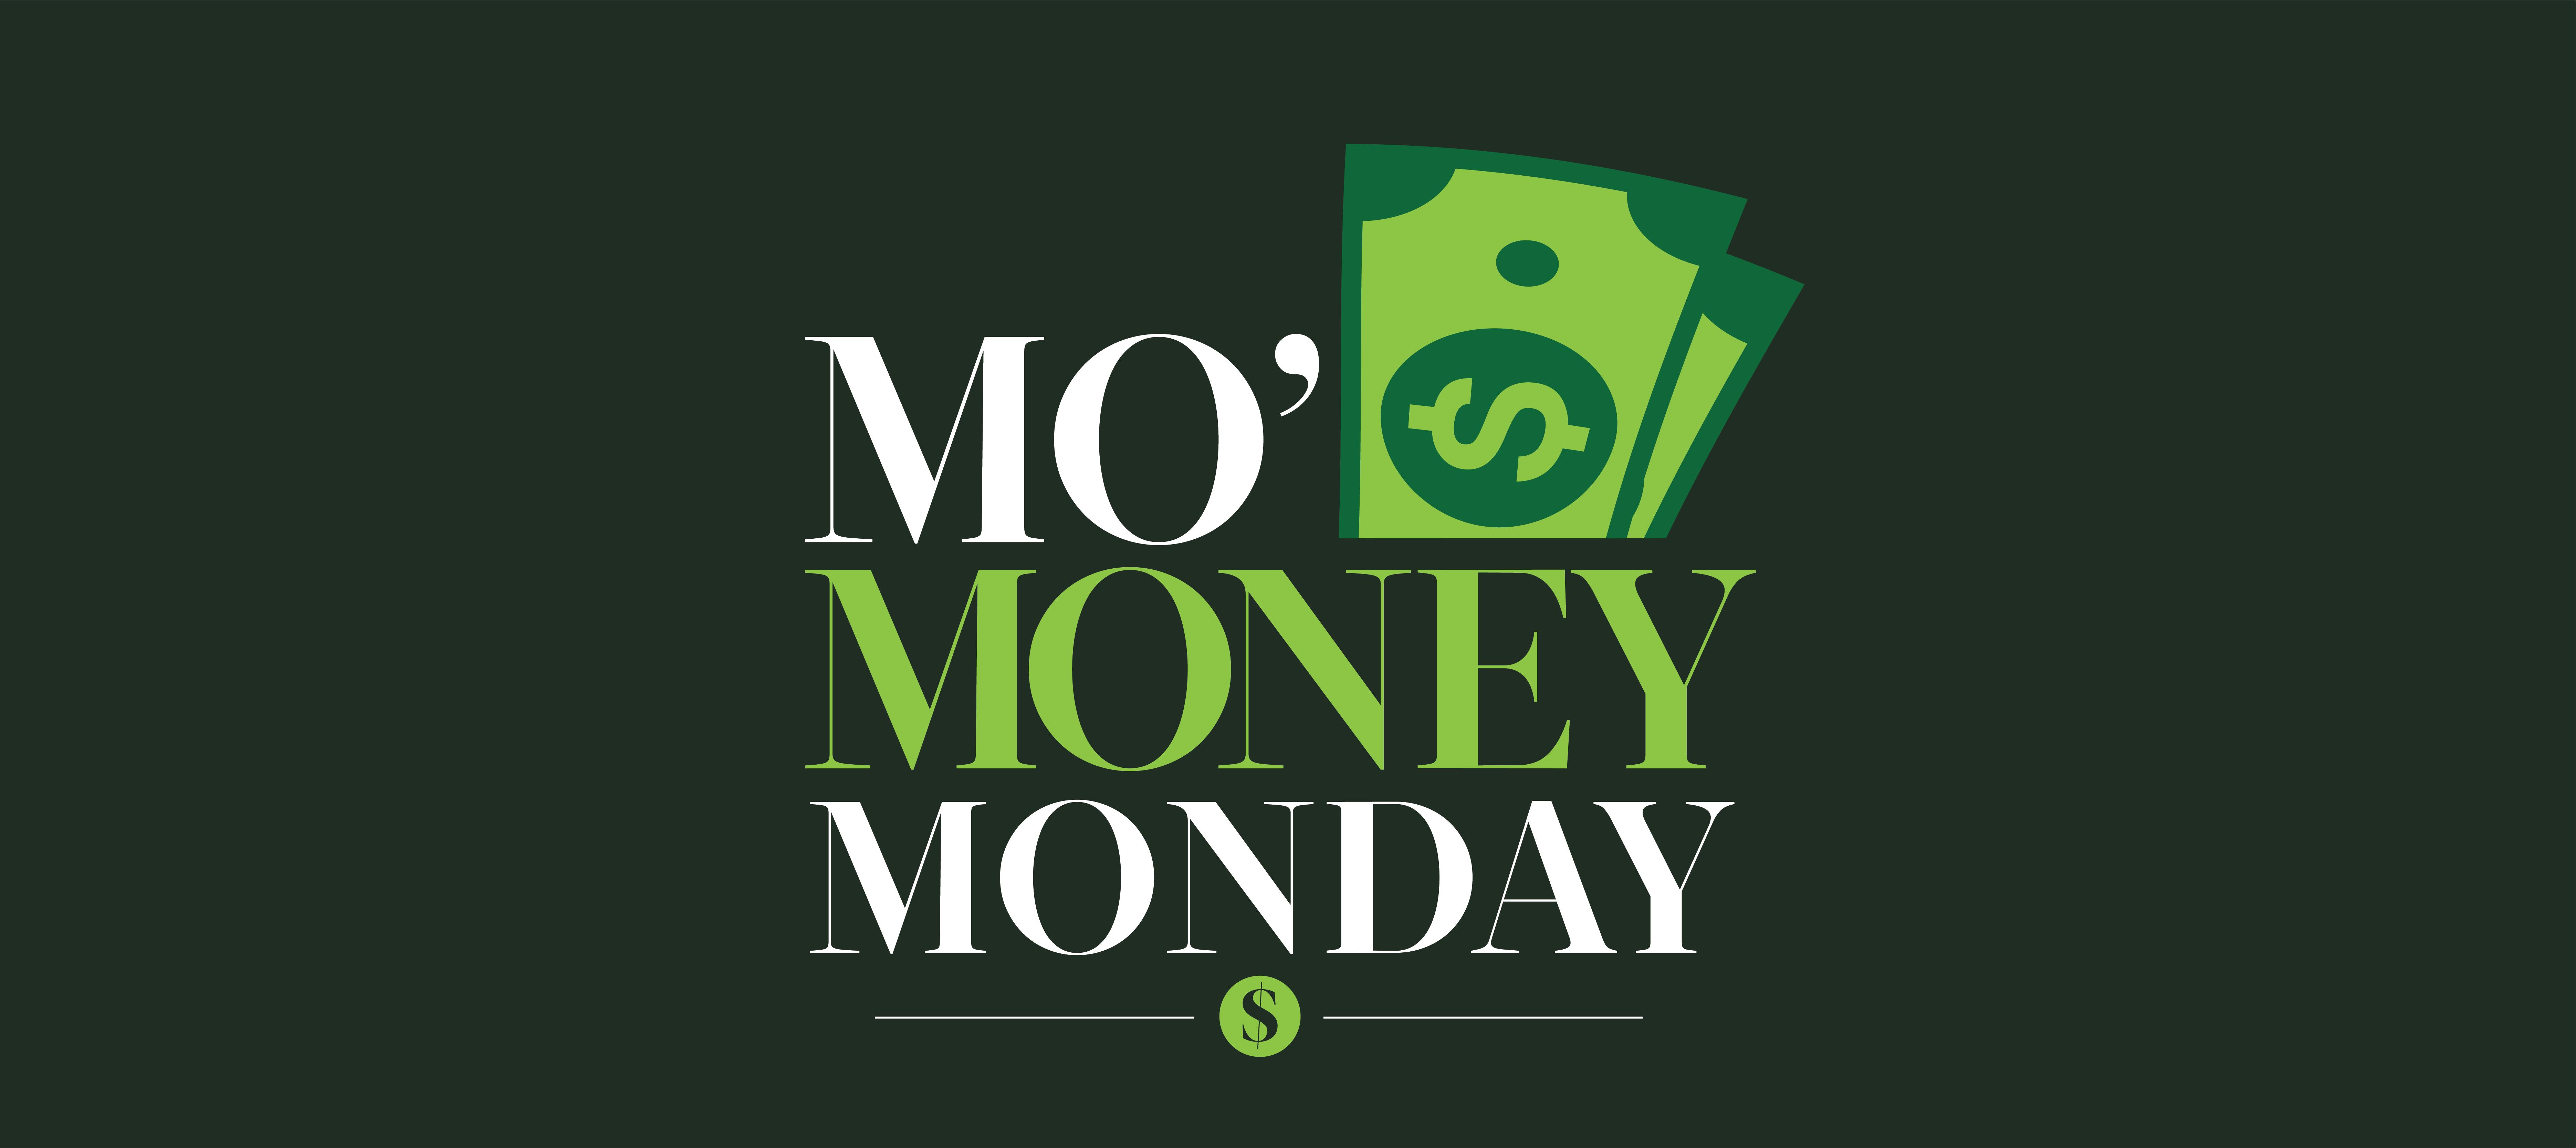 Mo' Money Monday